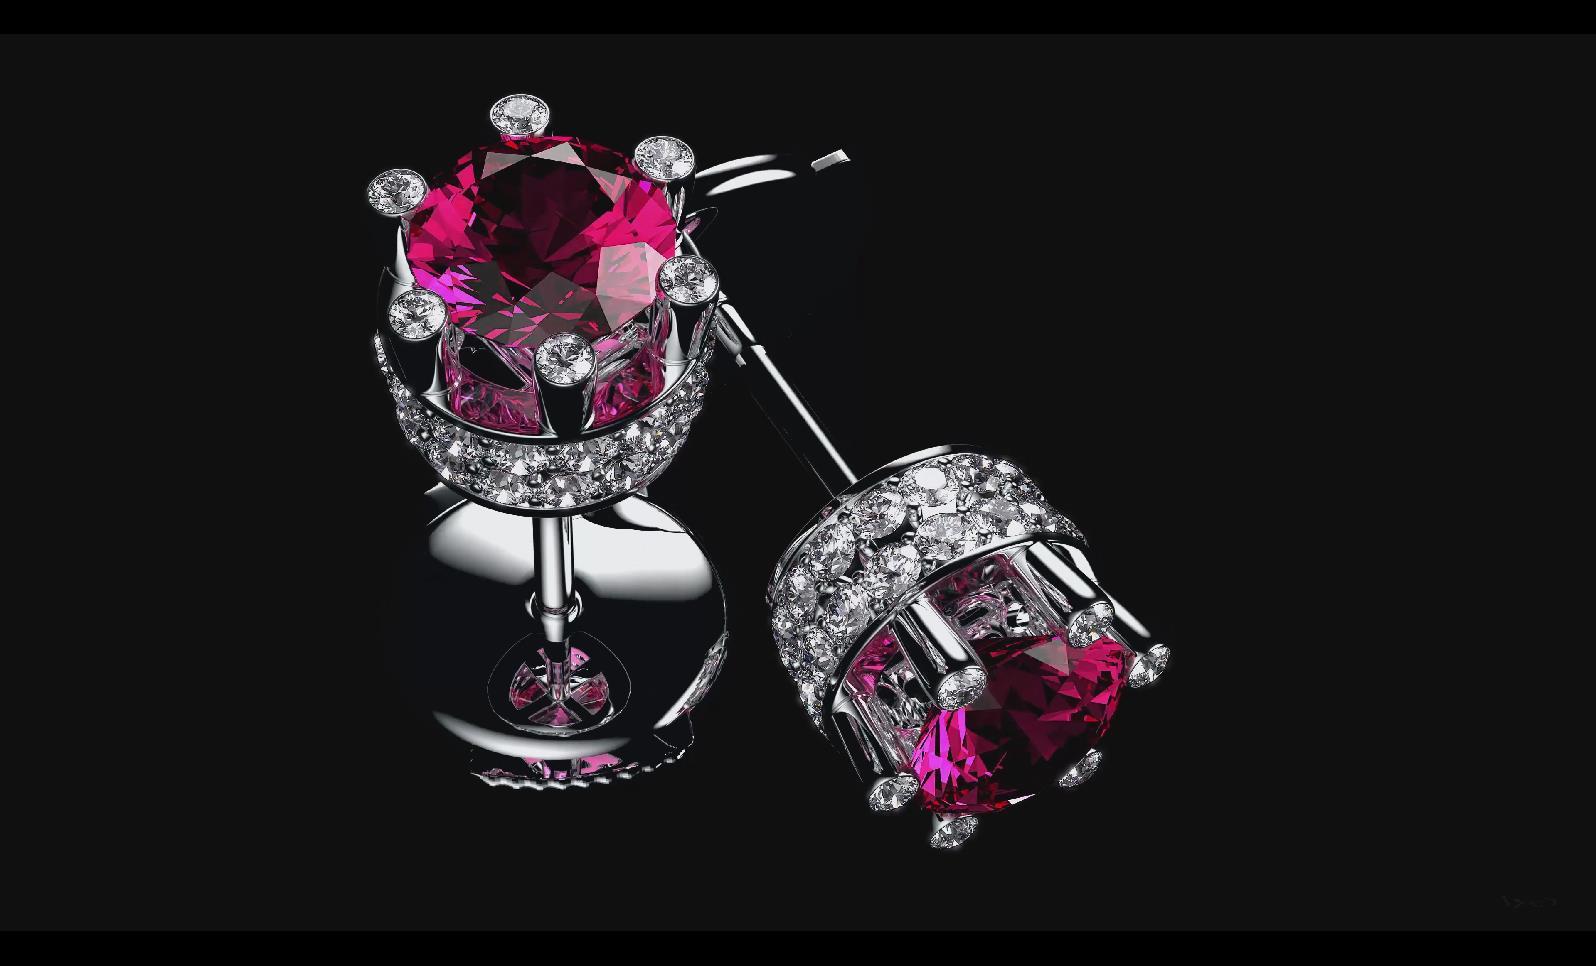 BS 085 BS 65 4K钻戒展示 珠宝工艺 珠宝设计 珠宝展示_5